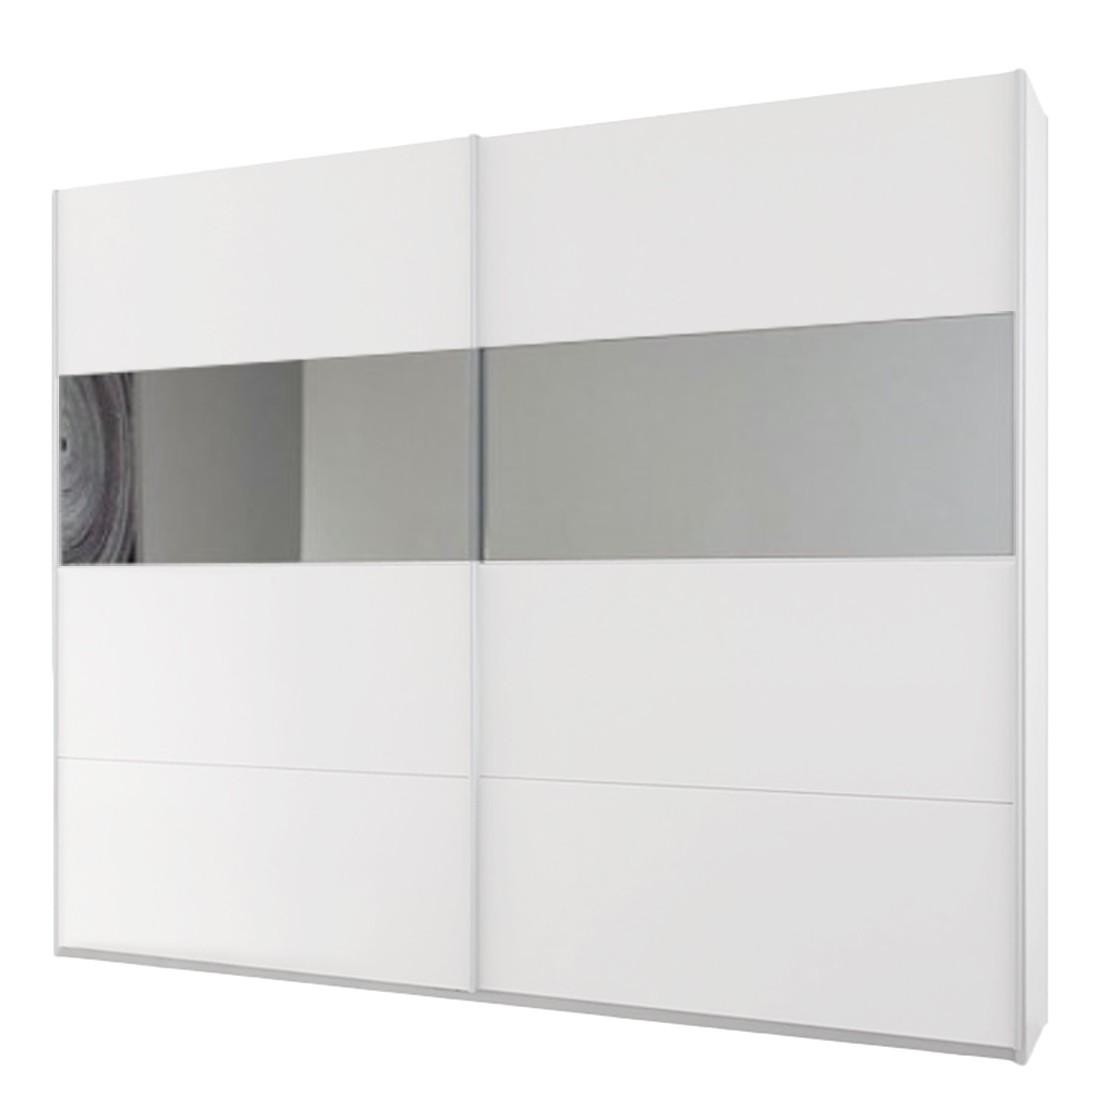 goedkoop Schuifdeurkast Quadra III Alpinewit spiegelglas 181cm 2 deurs 230cm Rauch